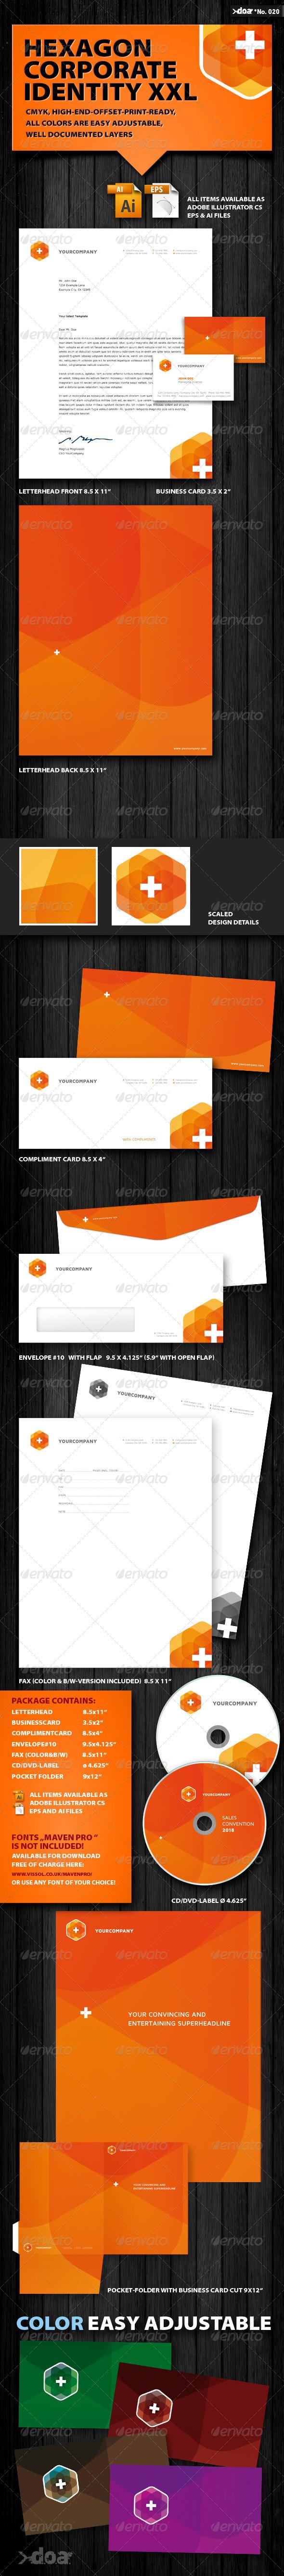 Hexagon Corporate Identity XXL - Stationery Print Templates